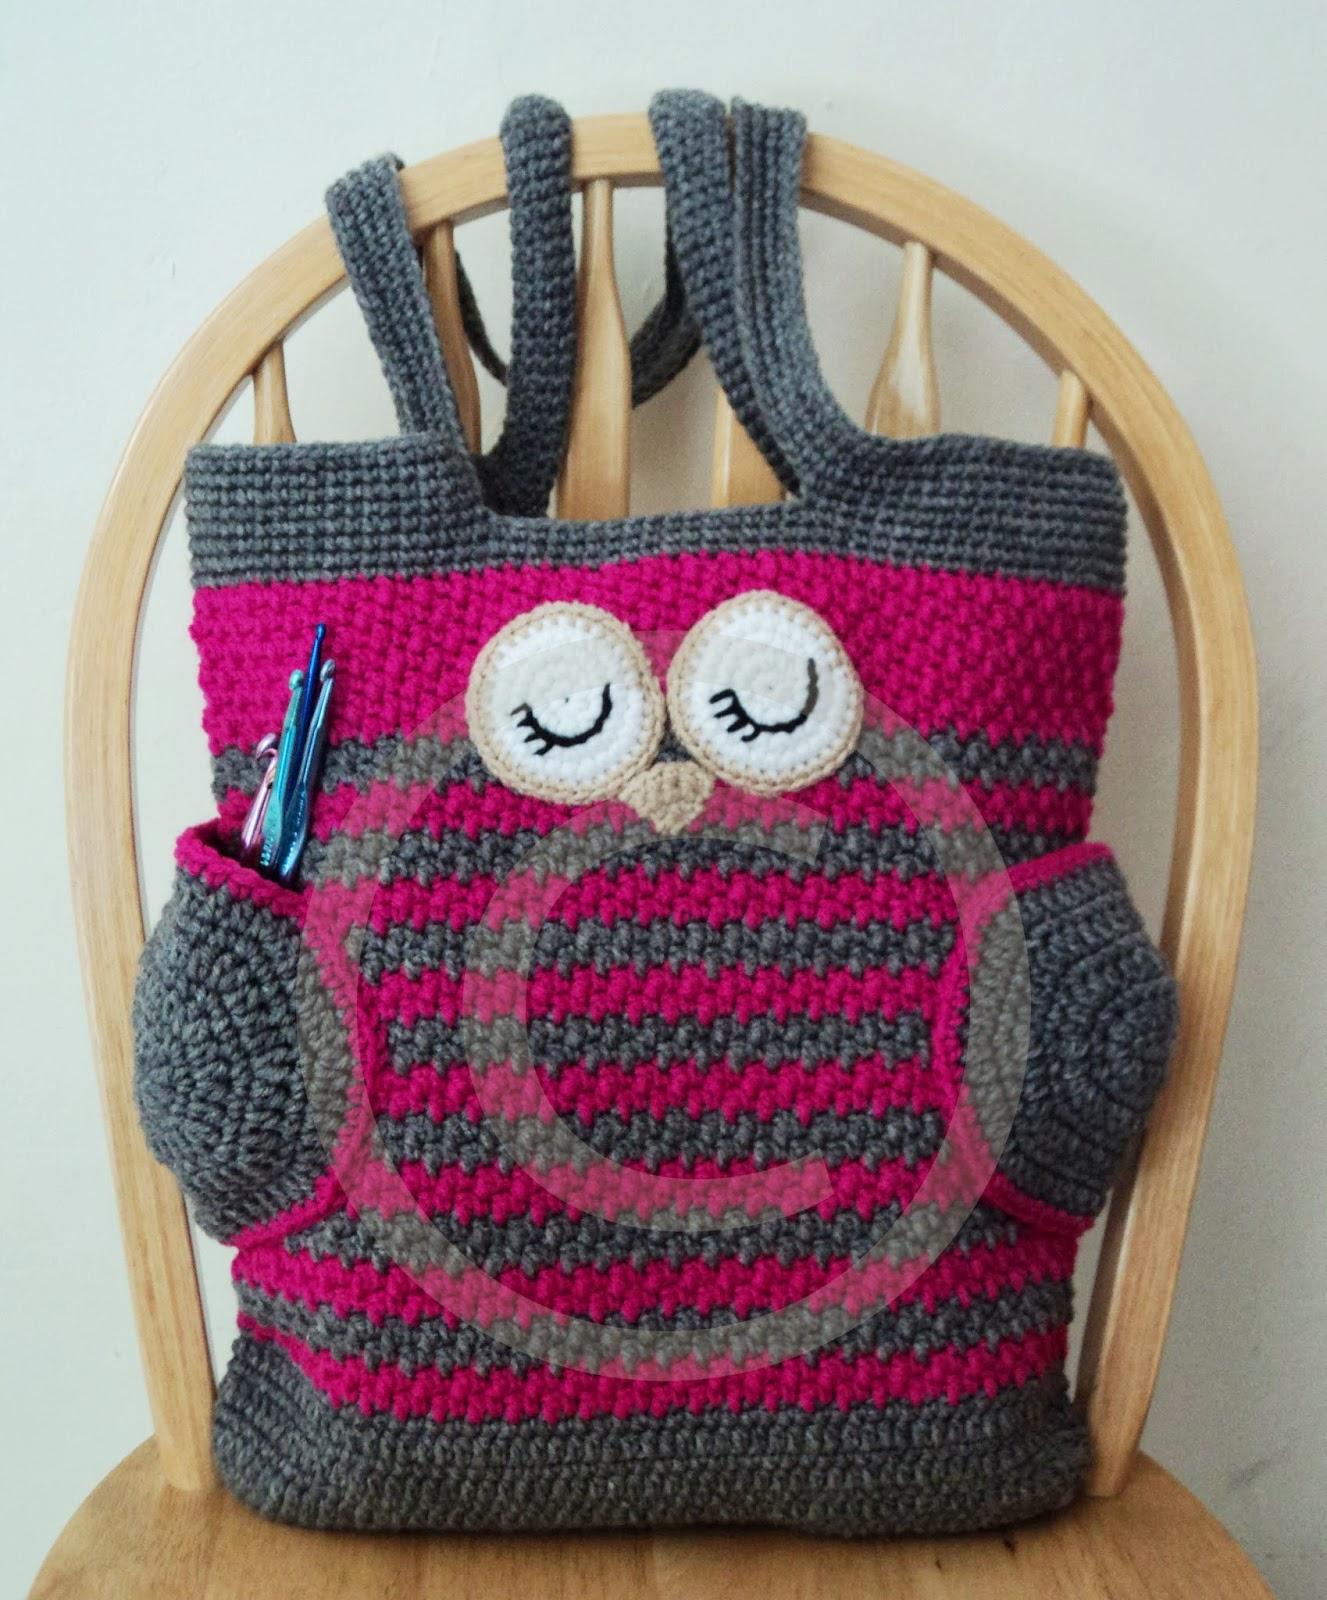 Cute Little Crafts: Crochet Pattern:Sleepy Owl Tote Bag